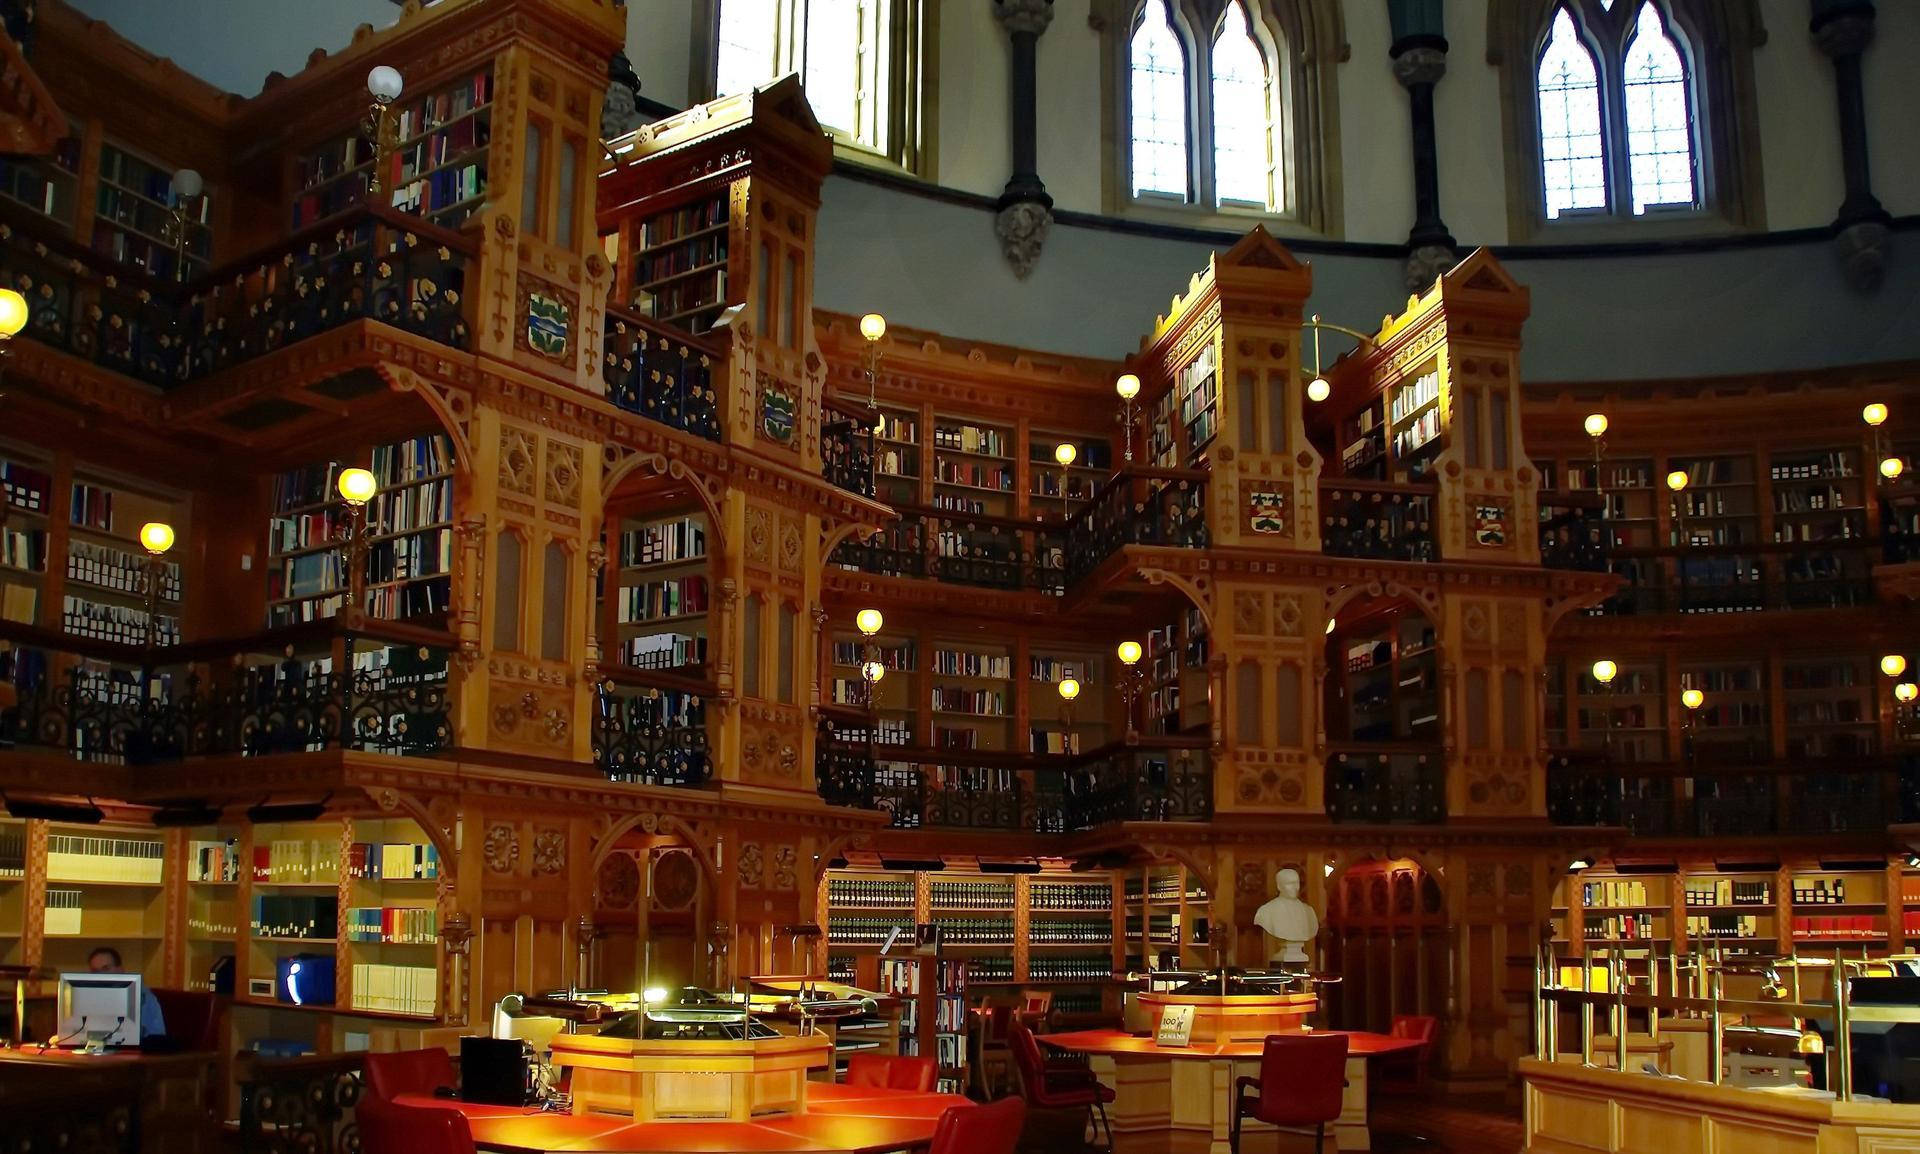 Library of Congress, Ottawa